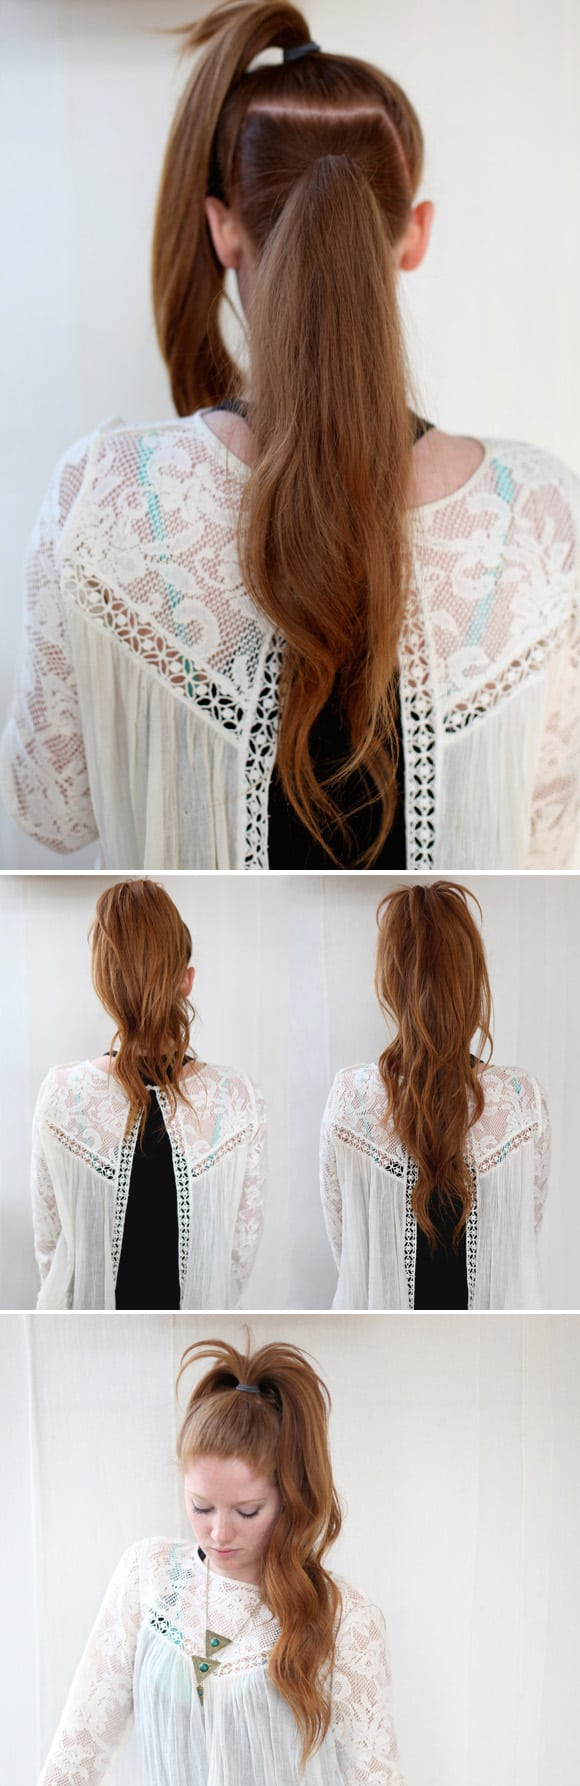 The illusion ponytail